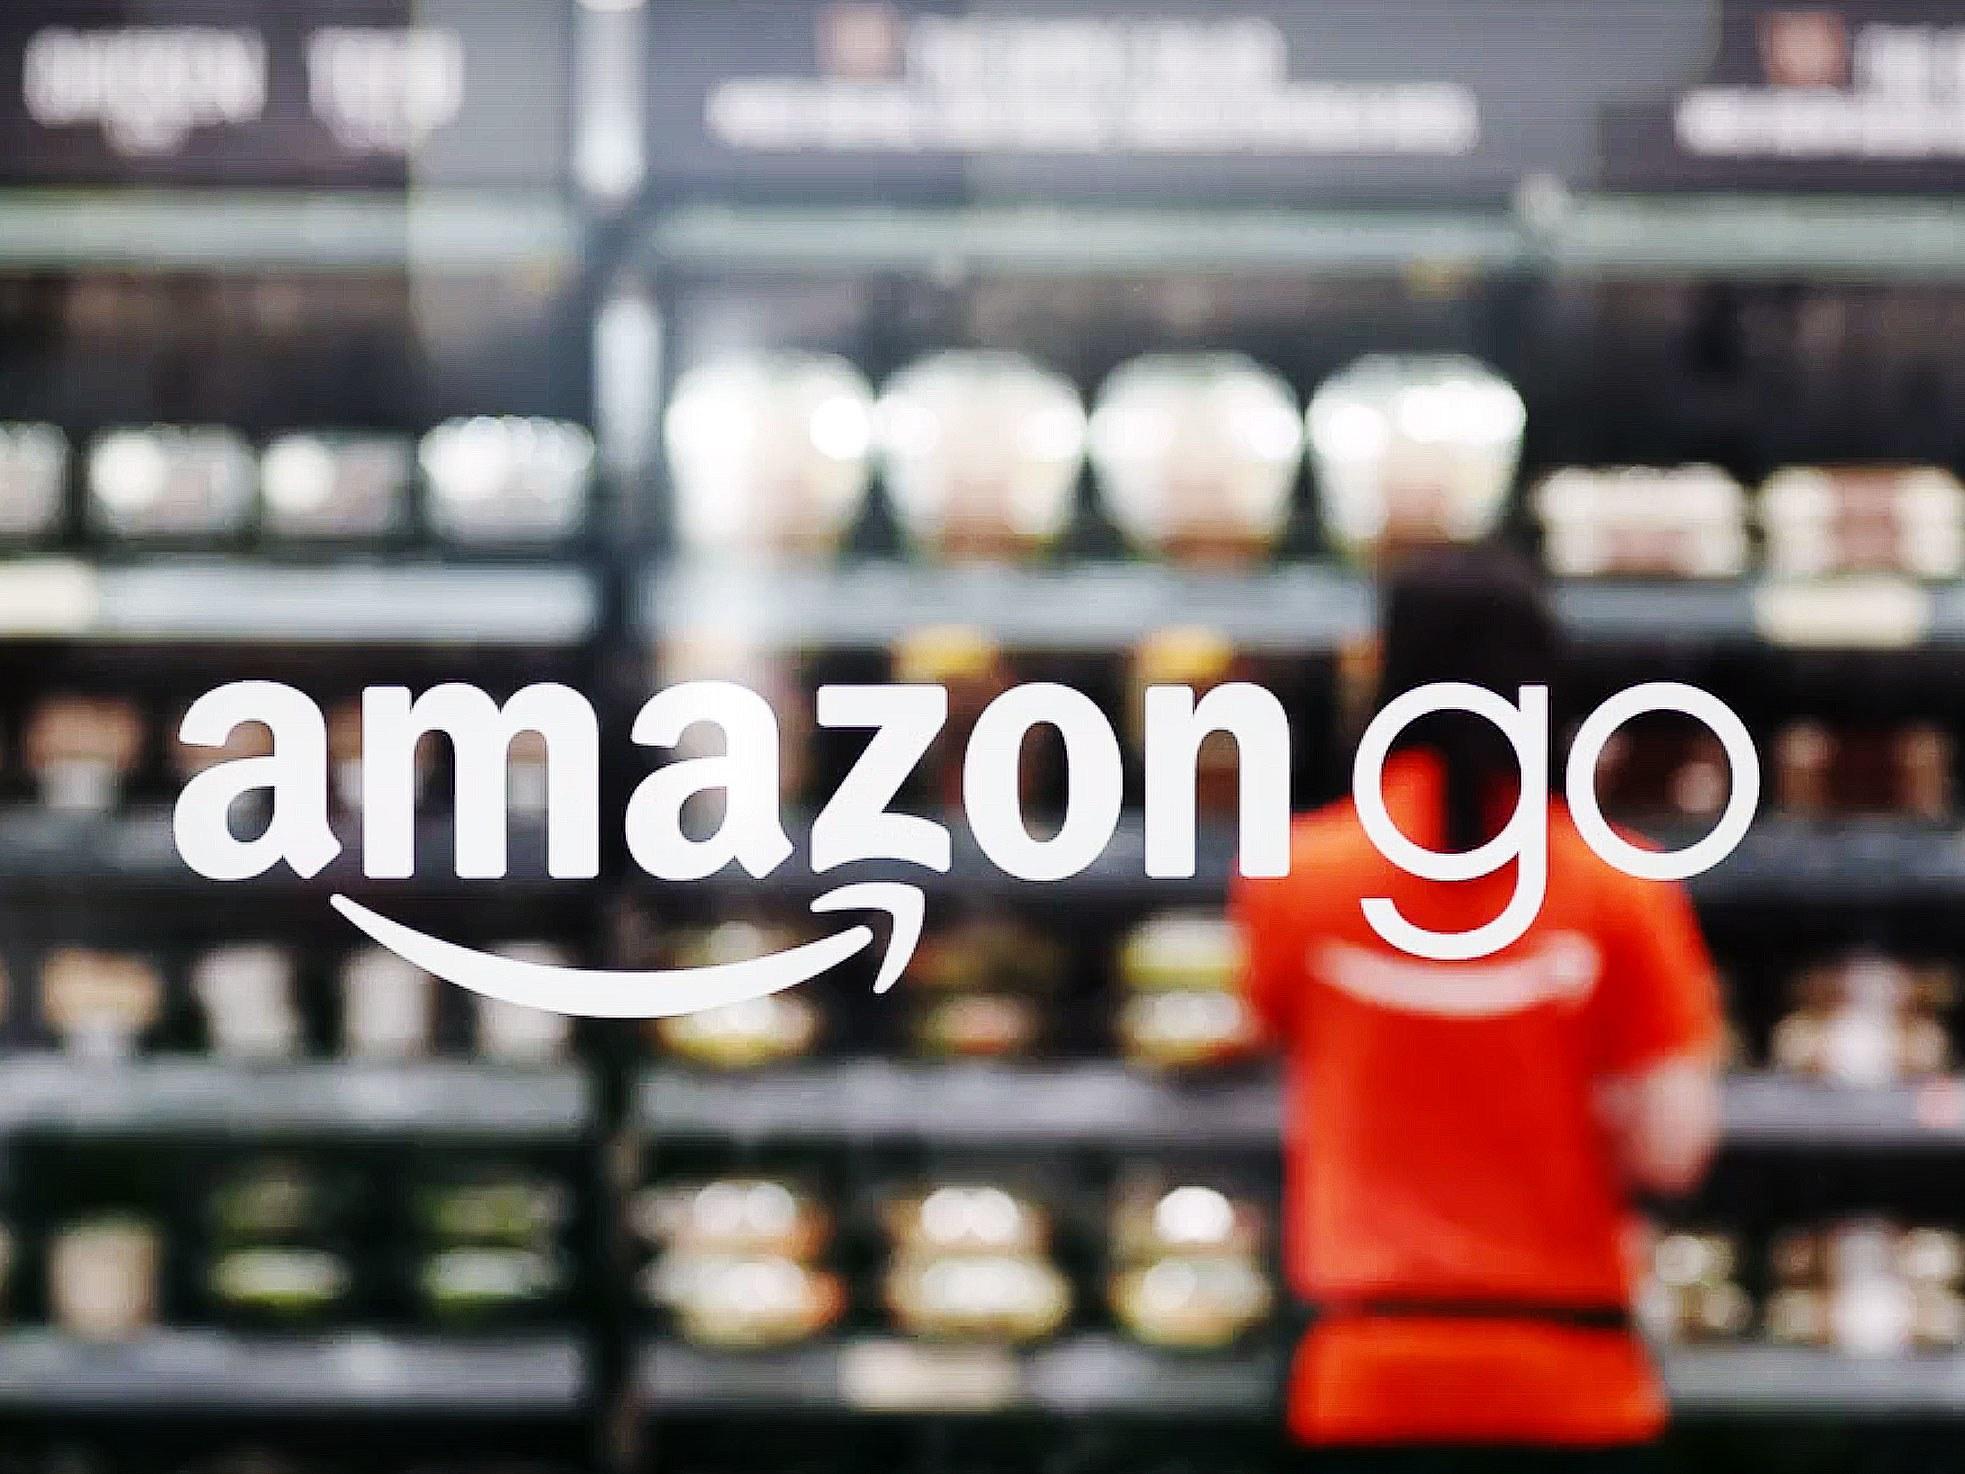 Amazons andra obemannade butik blev mindre - inte större